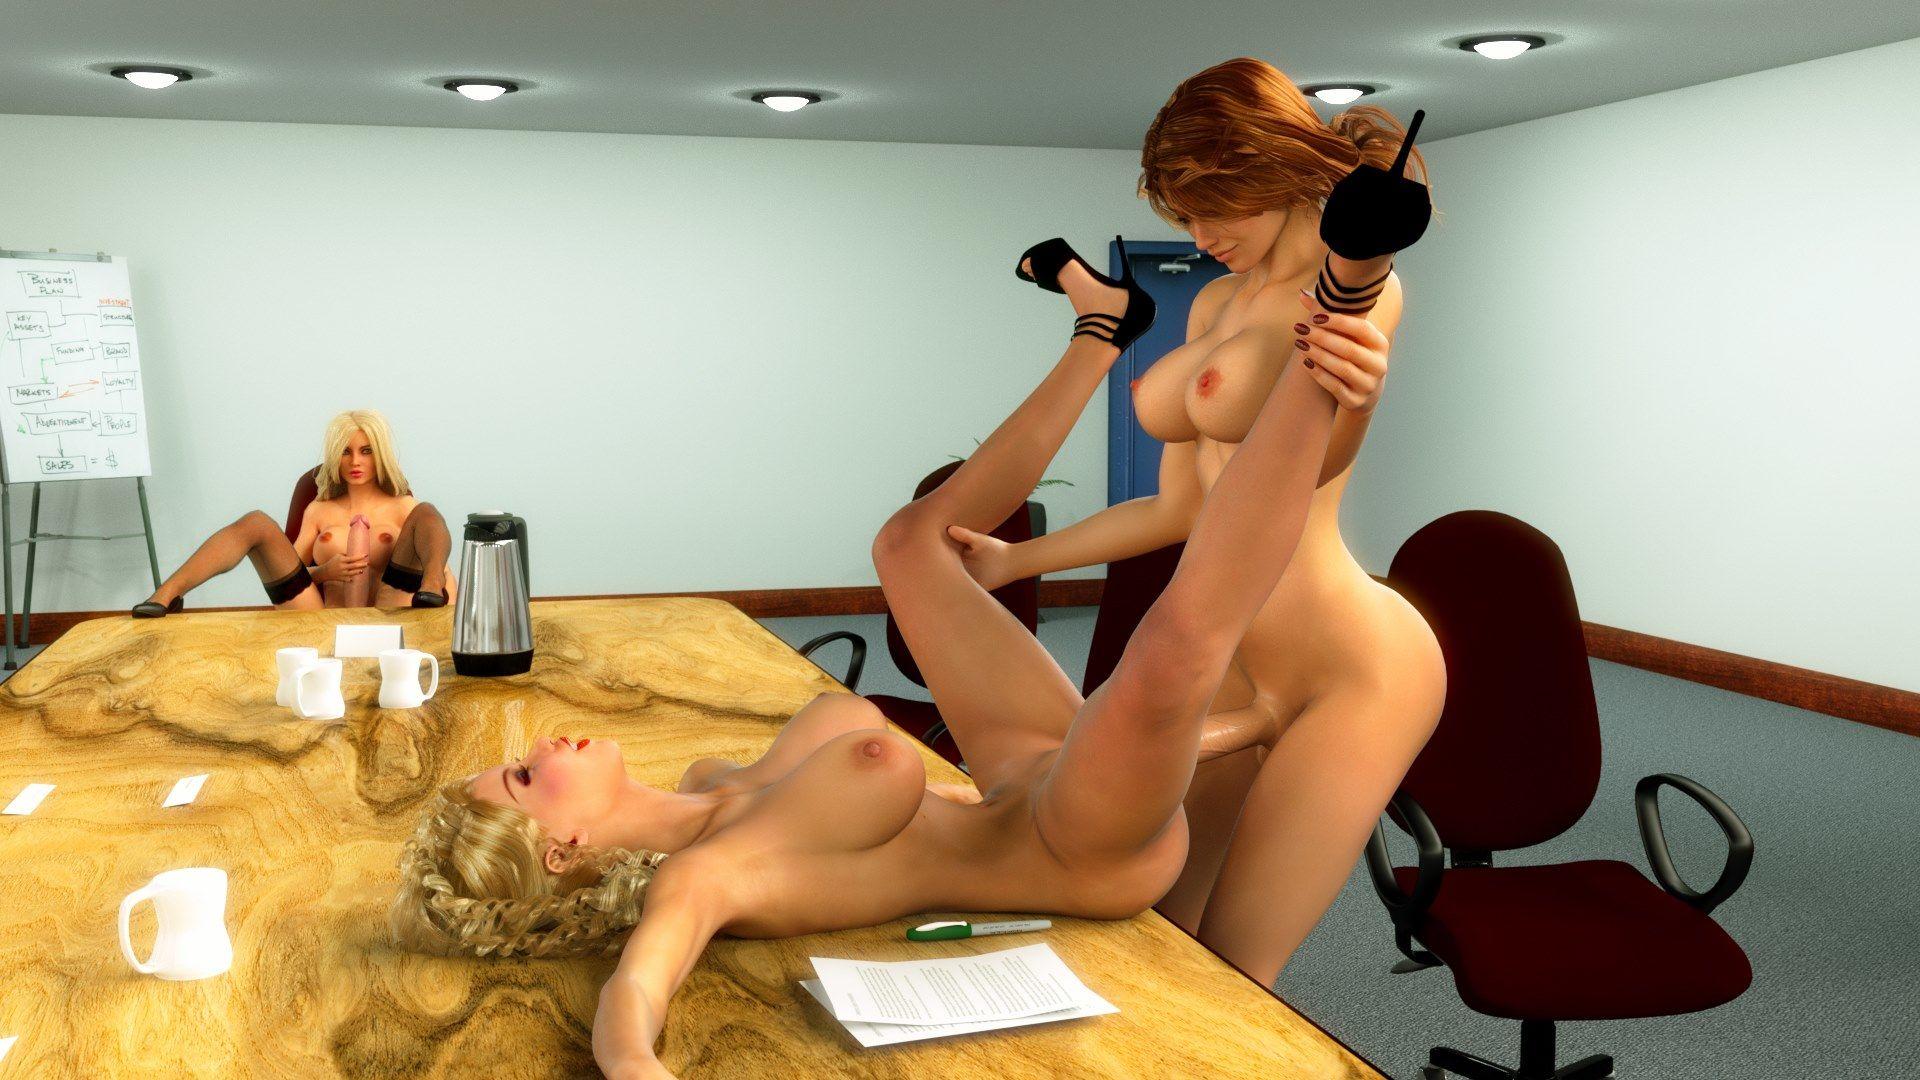 literotica-venus-school-of-sex-the-prestige-nude-scene